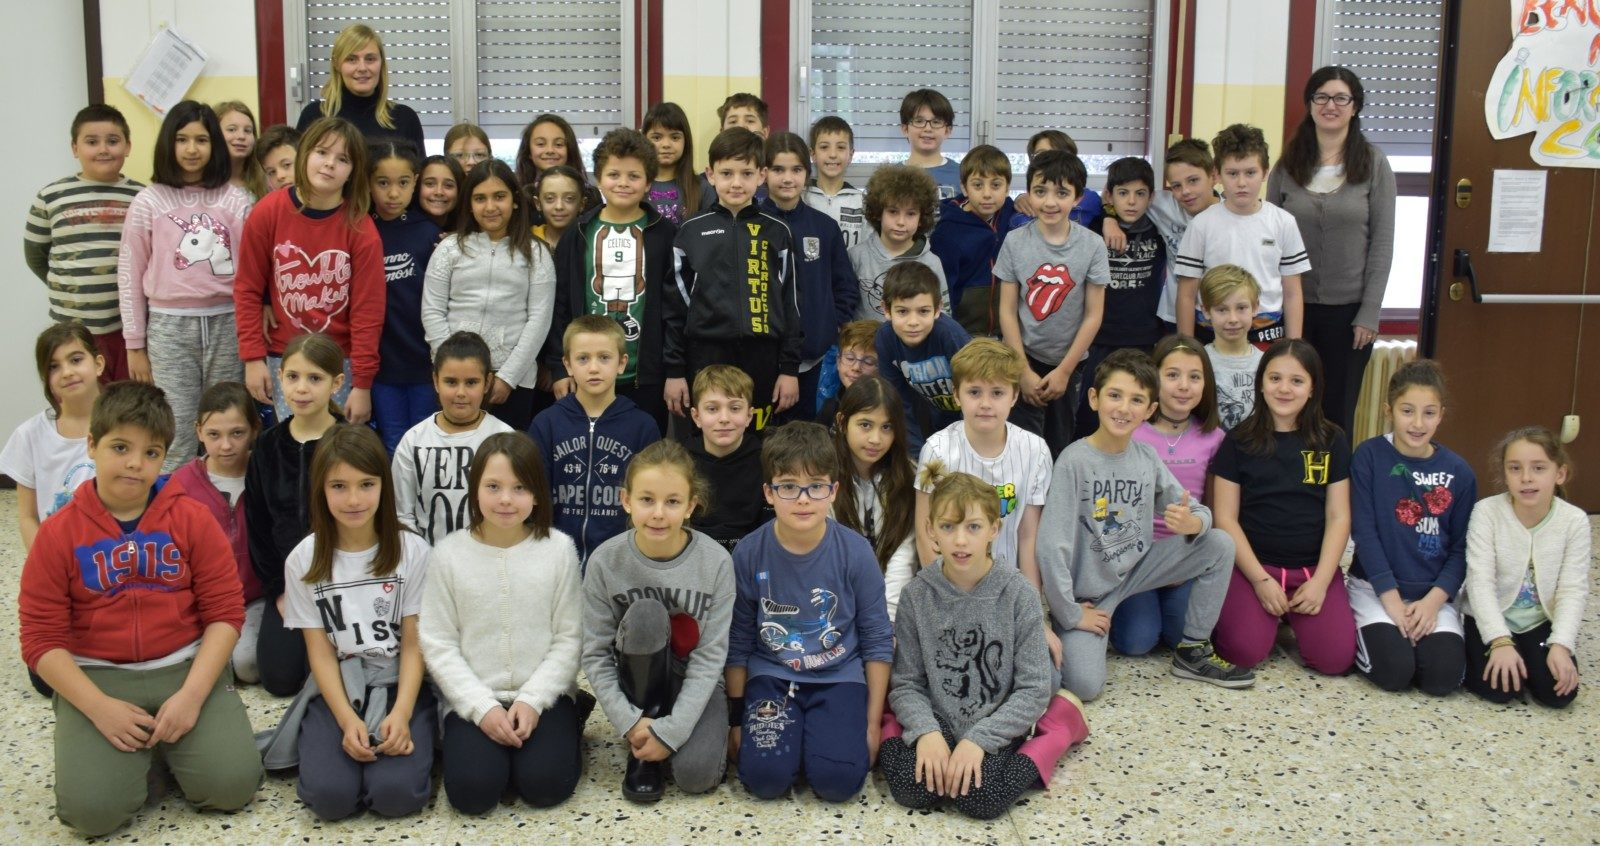 ALICoding Scuola Don Milani